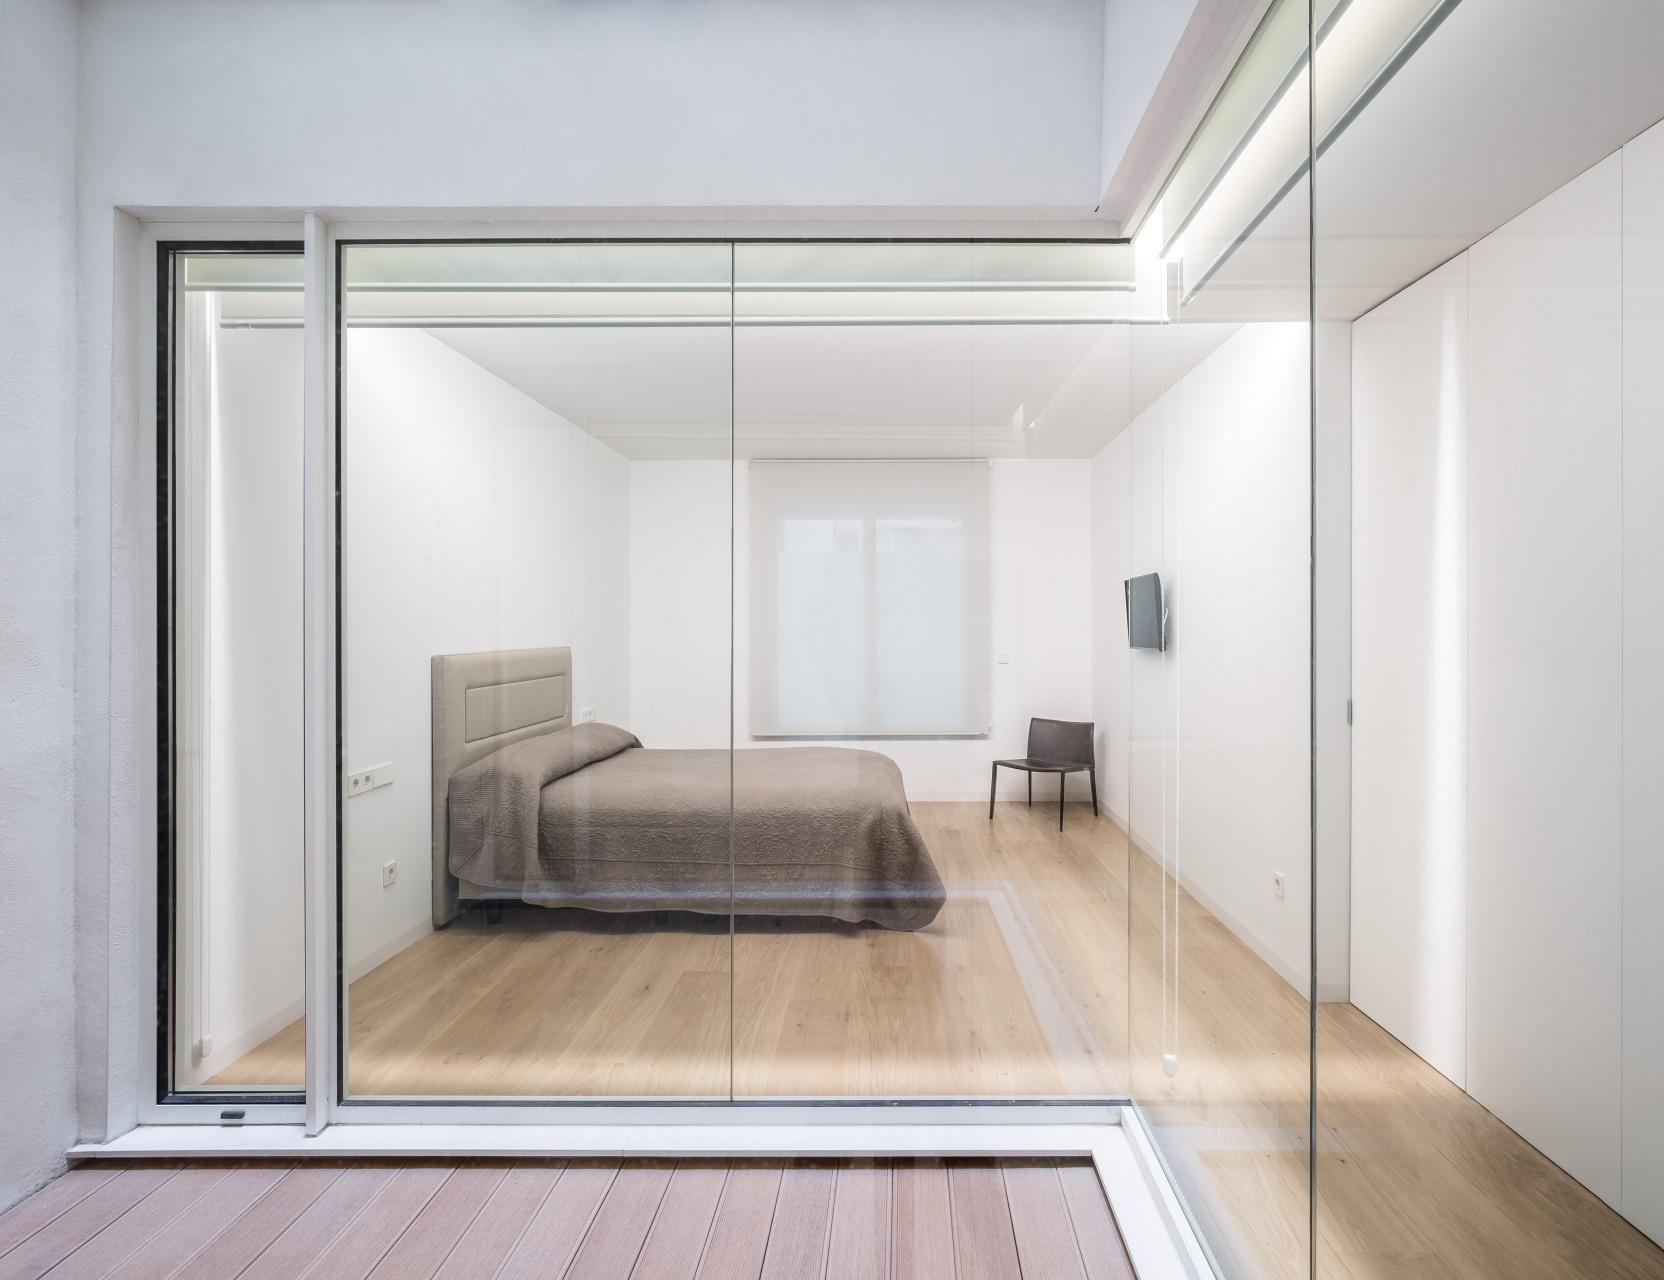 fotografia-arquitectura-interiorismo-valencia-german-cabo-gallardo-llopis-bfm-edificatoria-turia02 (18)